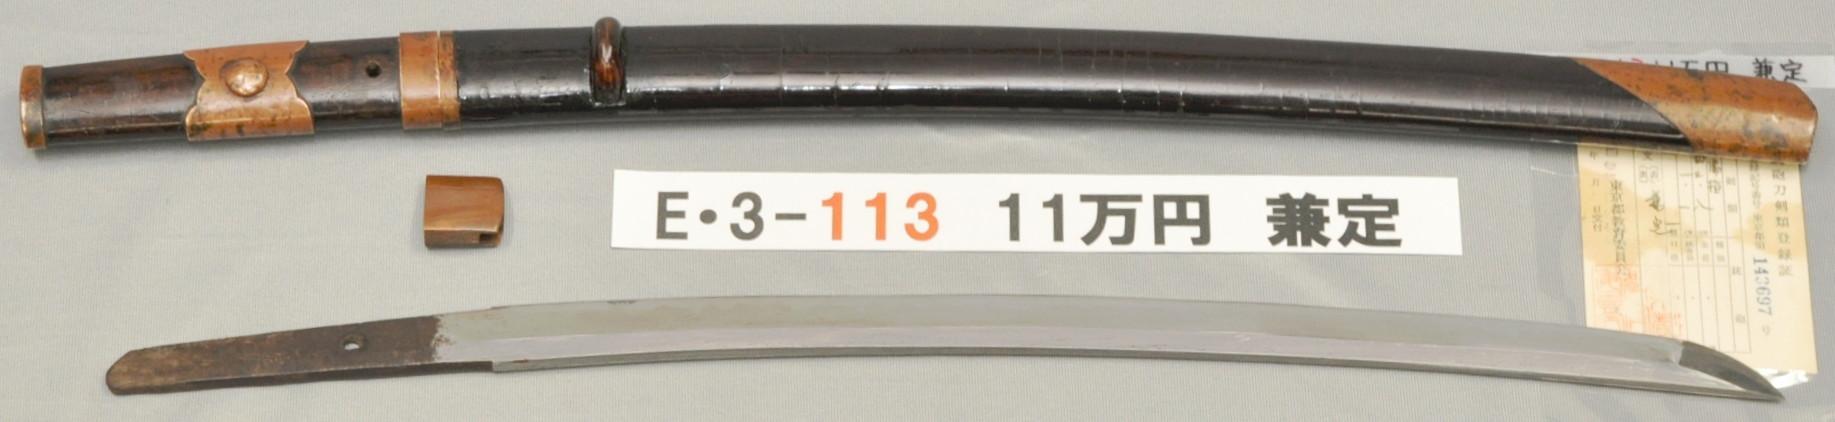 E3113